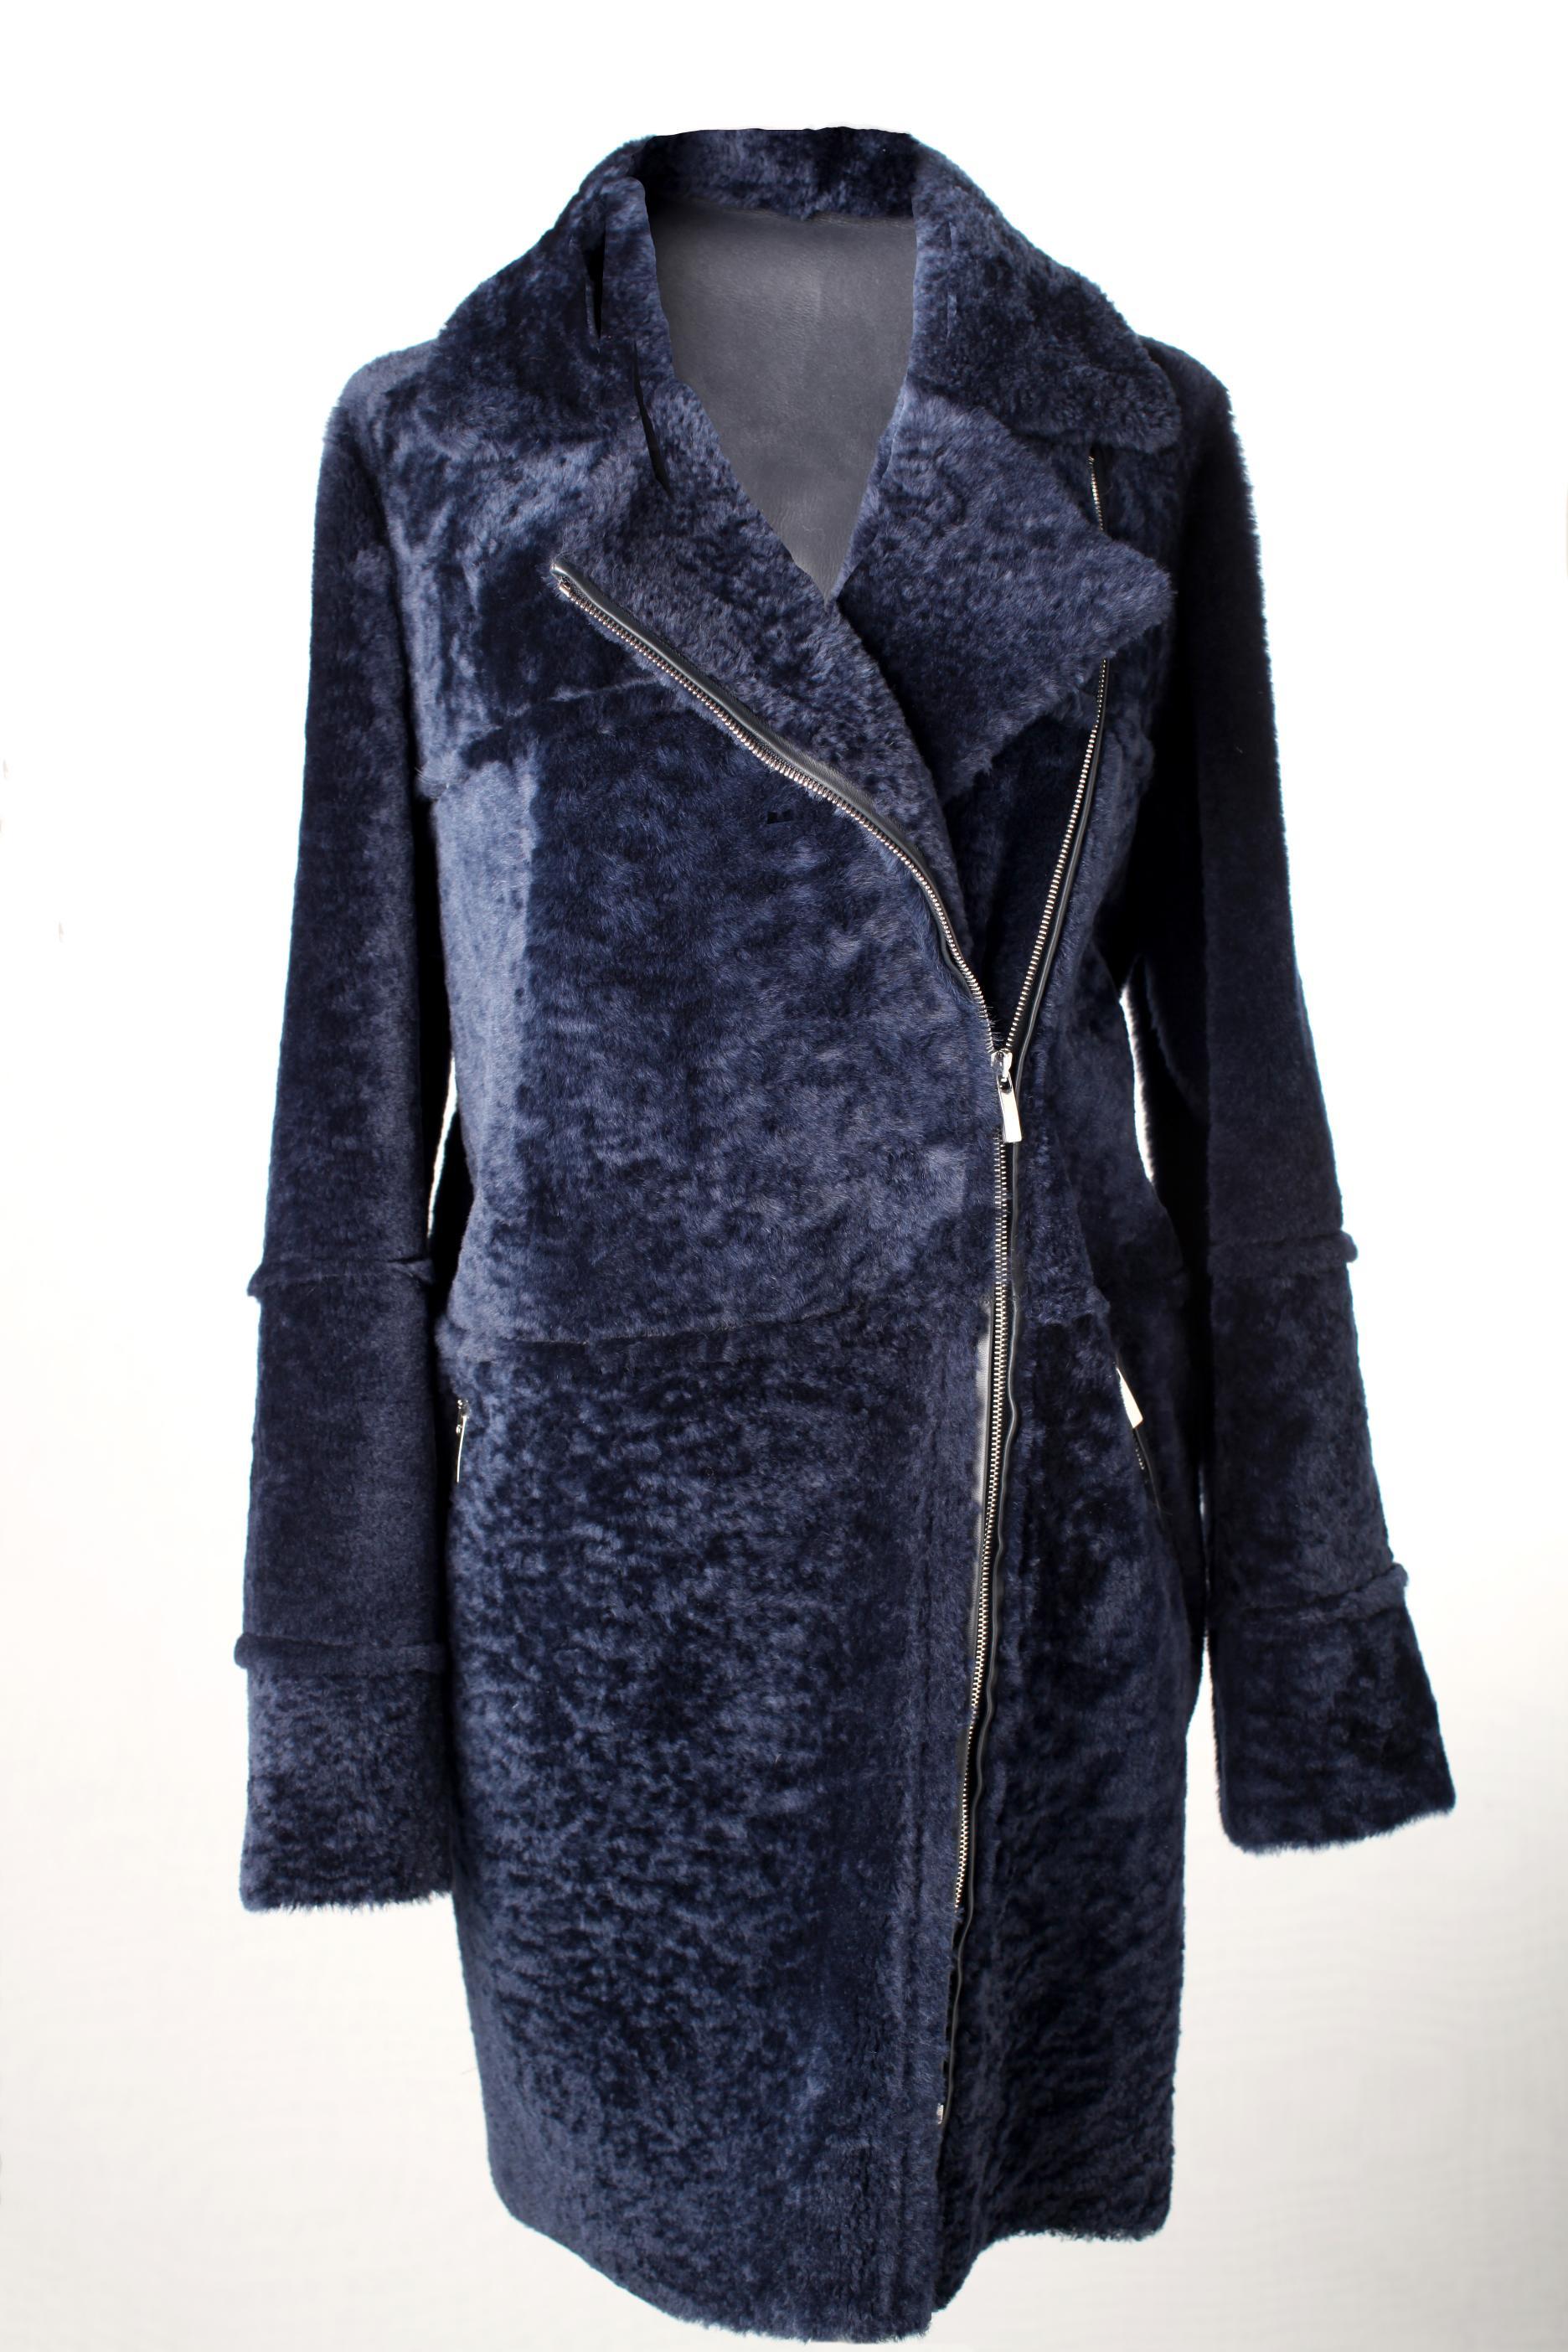 Merinillo semicurly blue silky 87cm